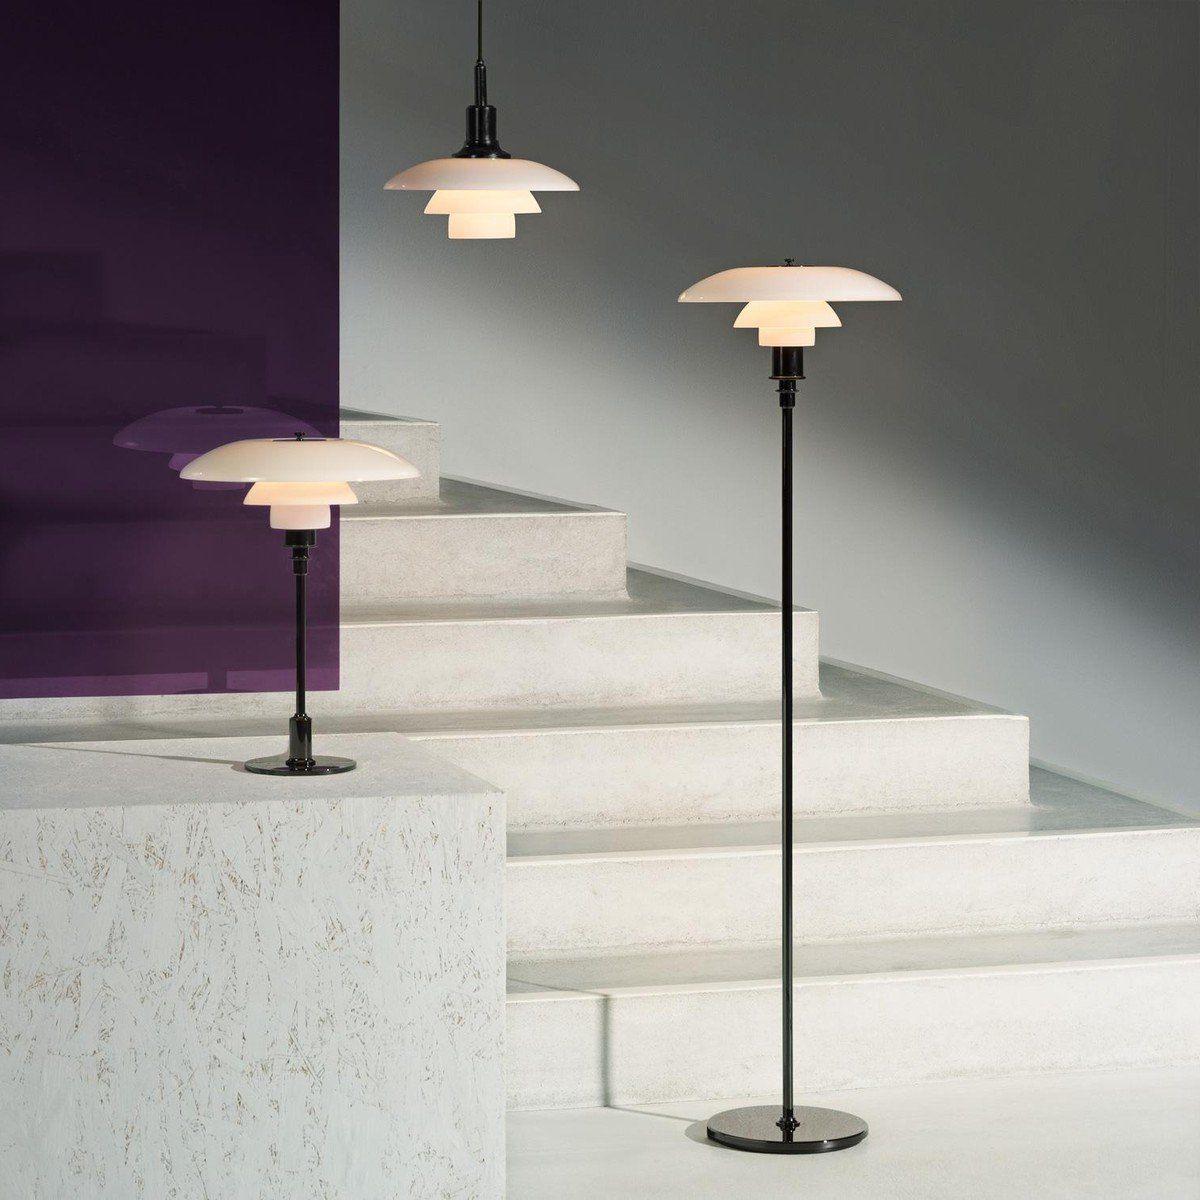 Ph 21 table lamp louis poulsen ambientedirect louis poulsen ph 21 table lamp mozeypictures Choice Image